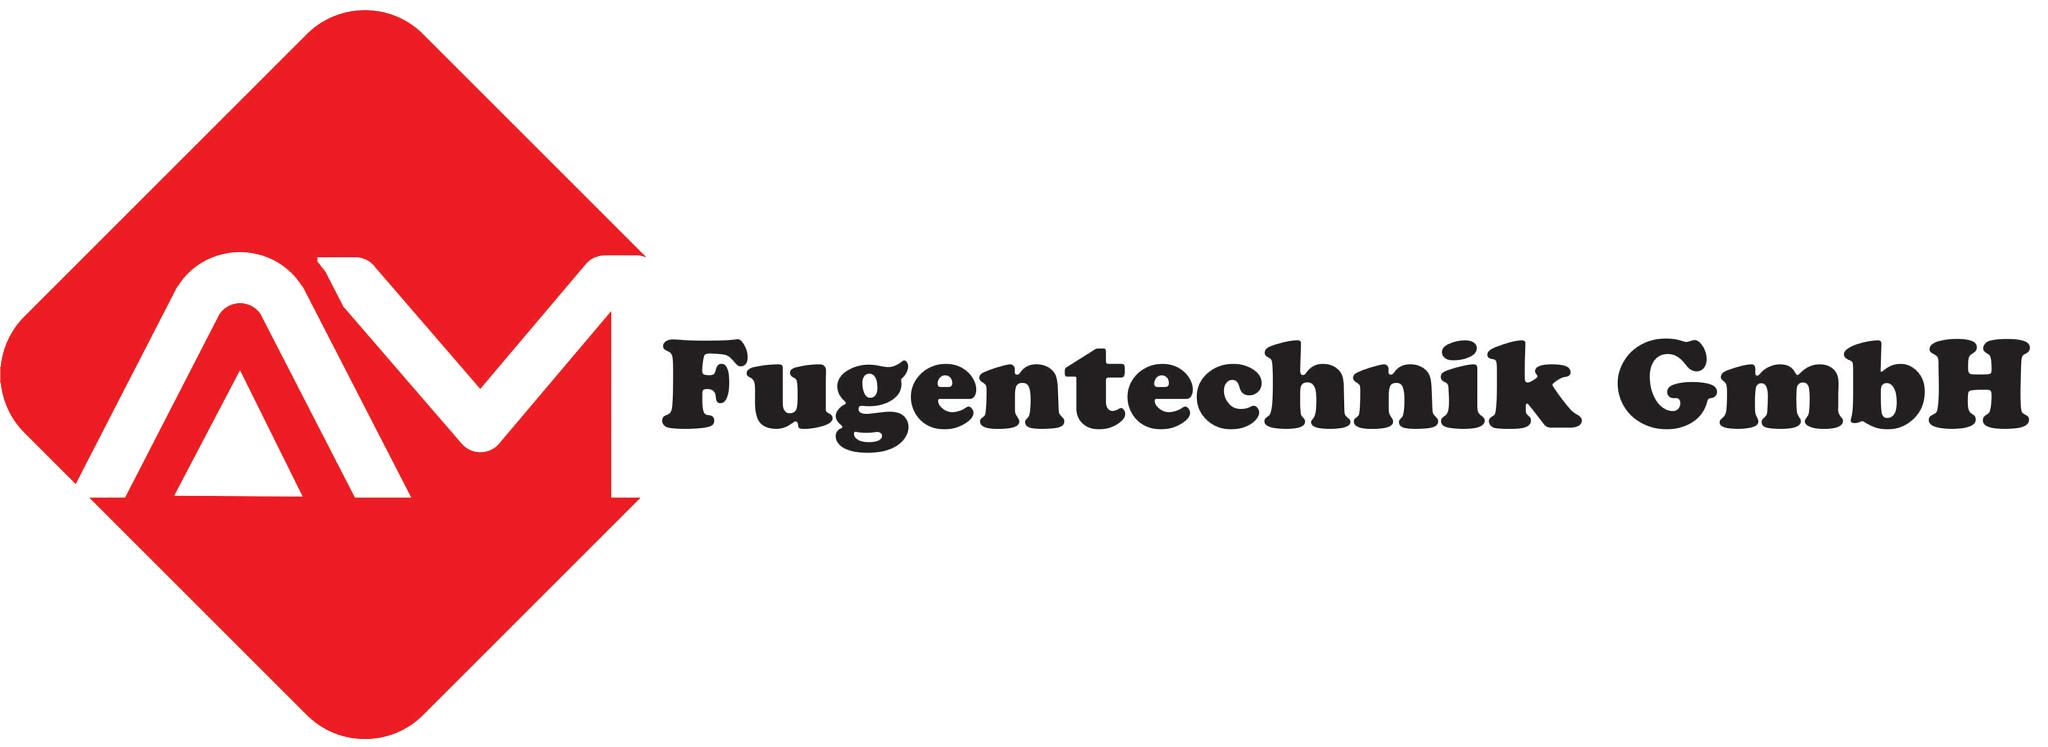 AM Fugentechnik GmbH